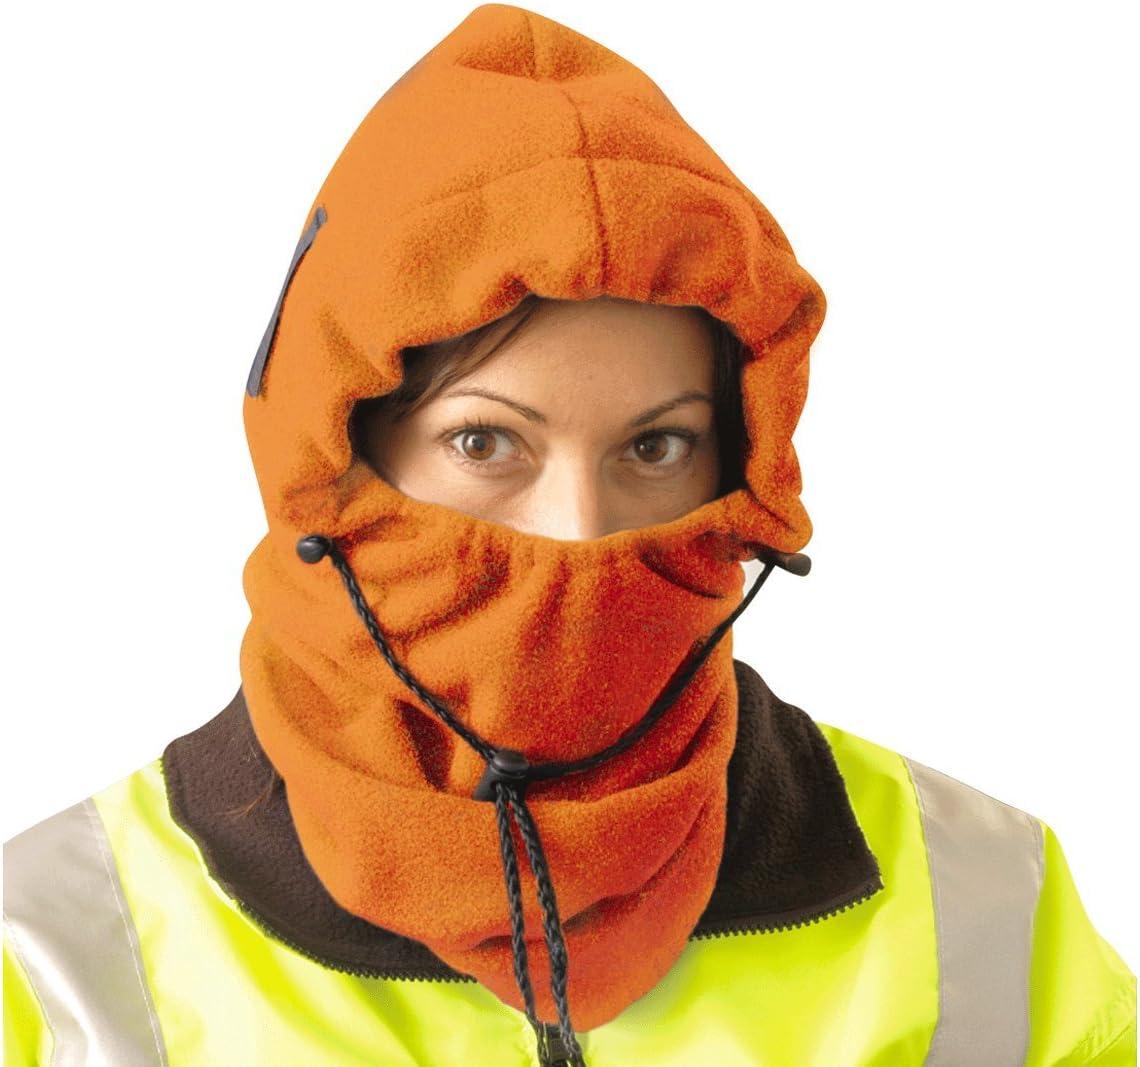 Miami Mall 3 in 1 Fleece Sales Balaclava - Hi-Viz Face Head Orange Warmer